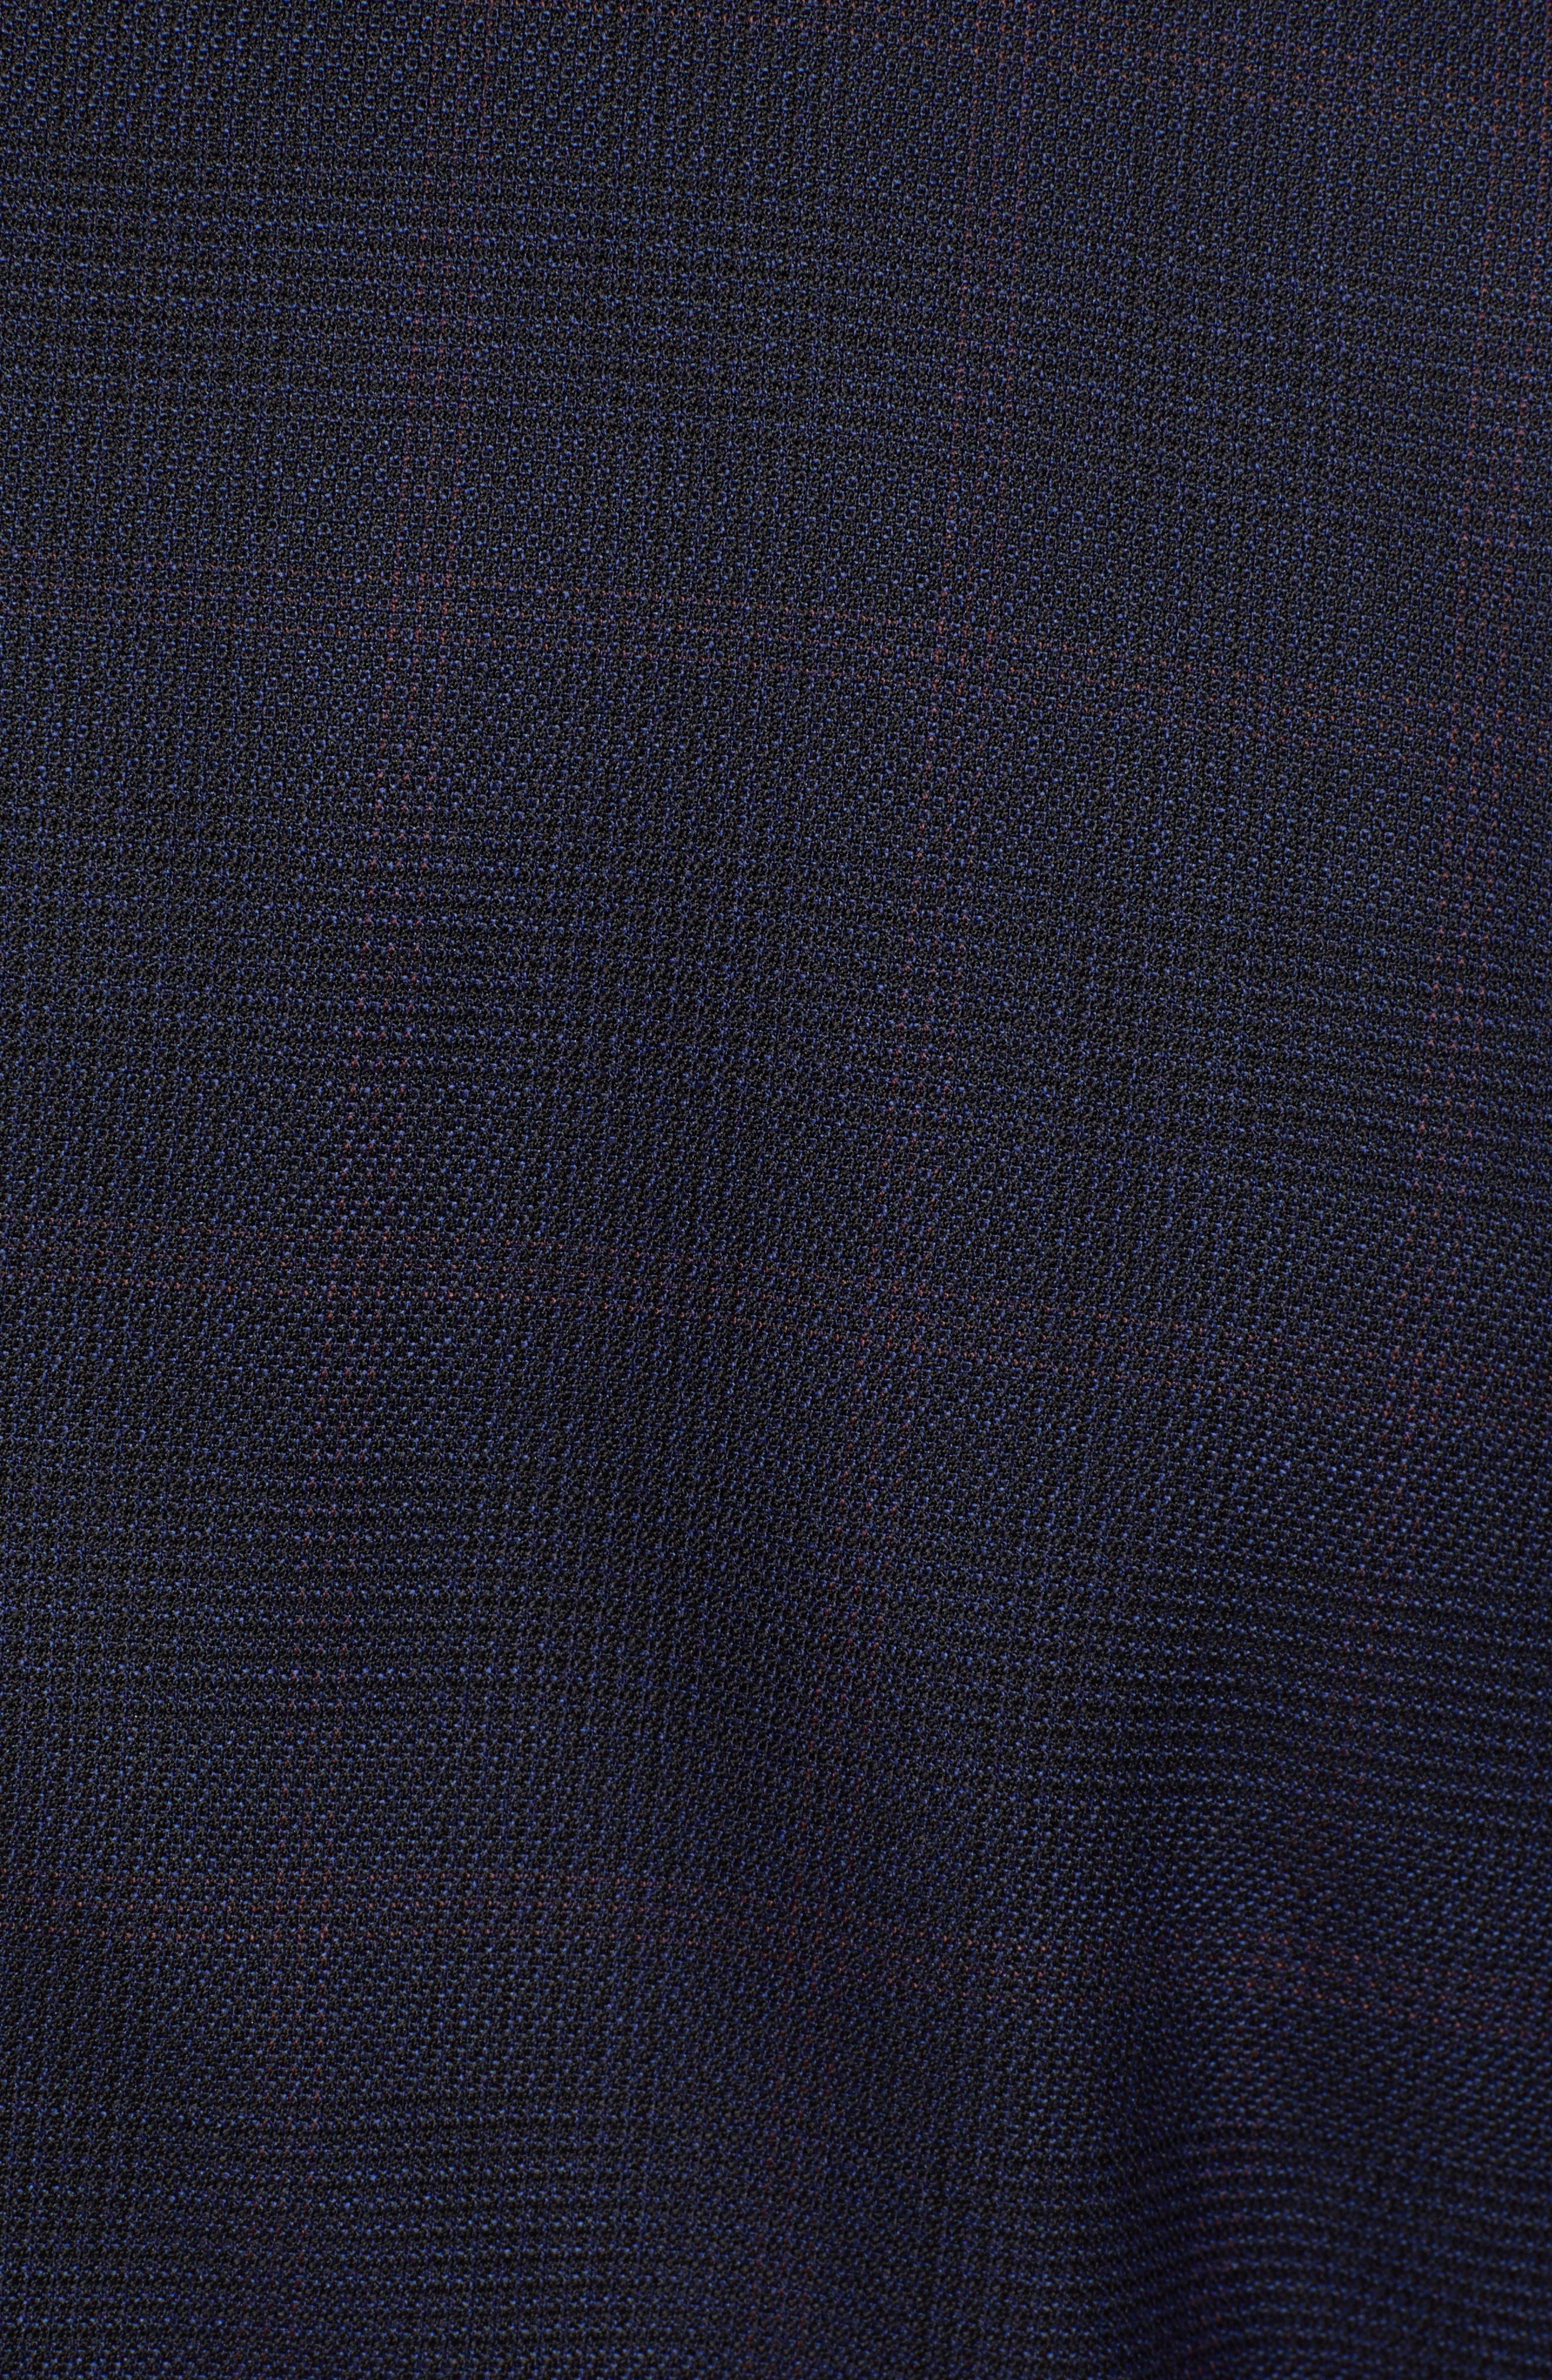 x Nordstrom Huge/Genius Trim Fit Plaid Wool Suit,                             Alternate thumbnail 9, color,                             NAVY